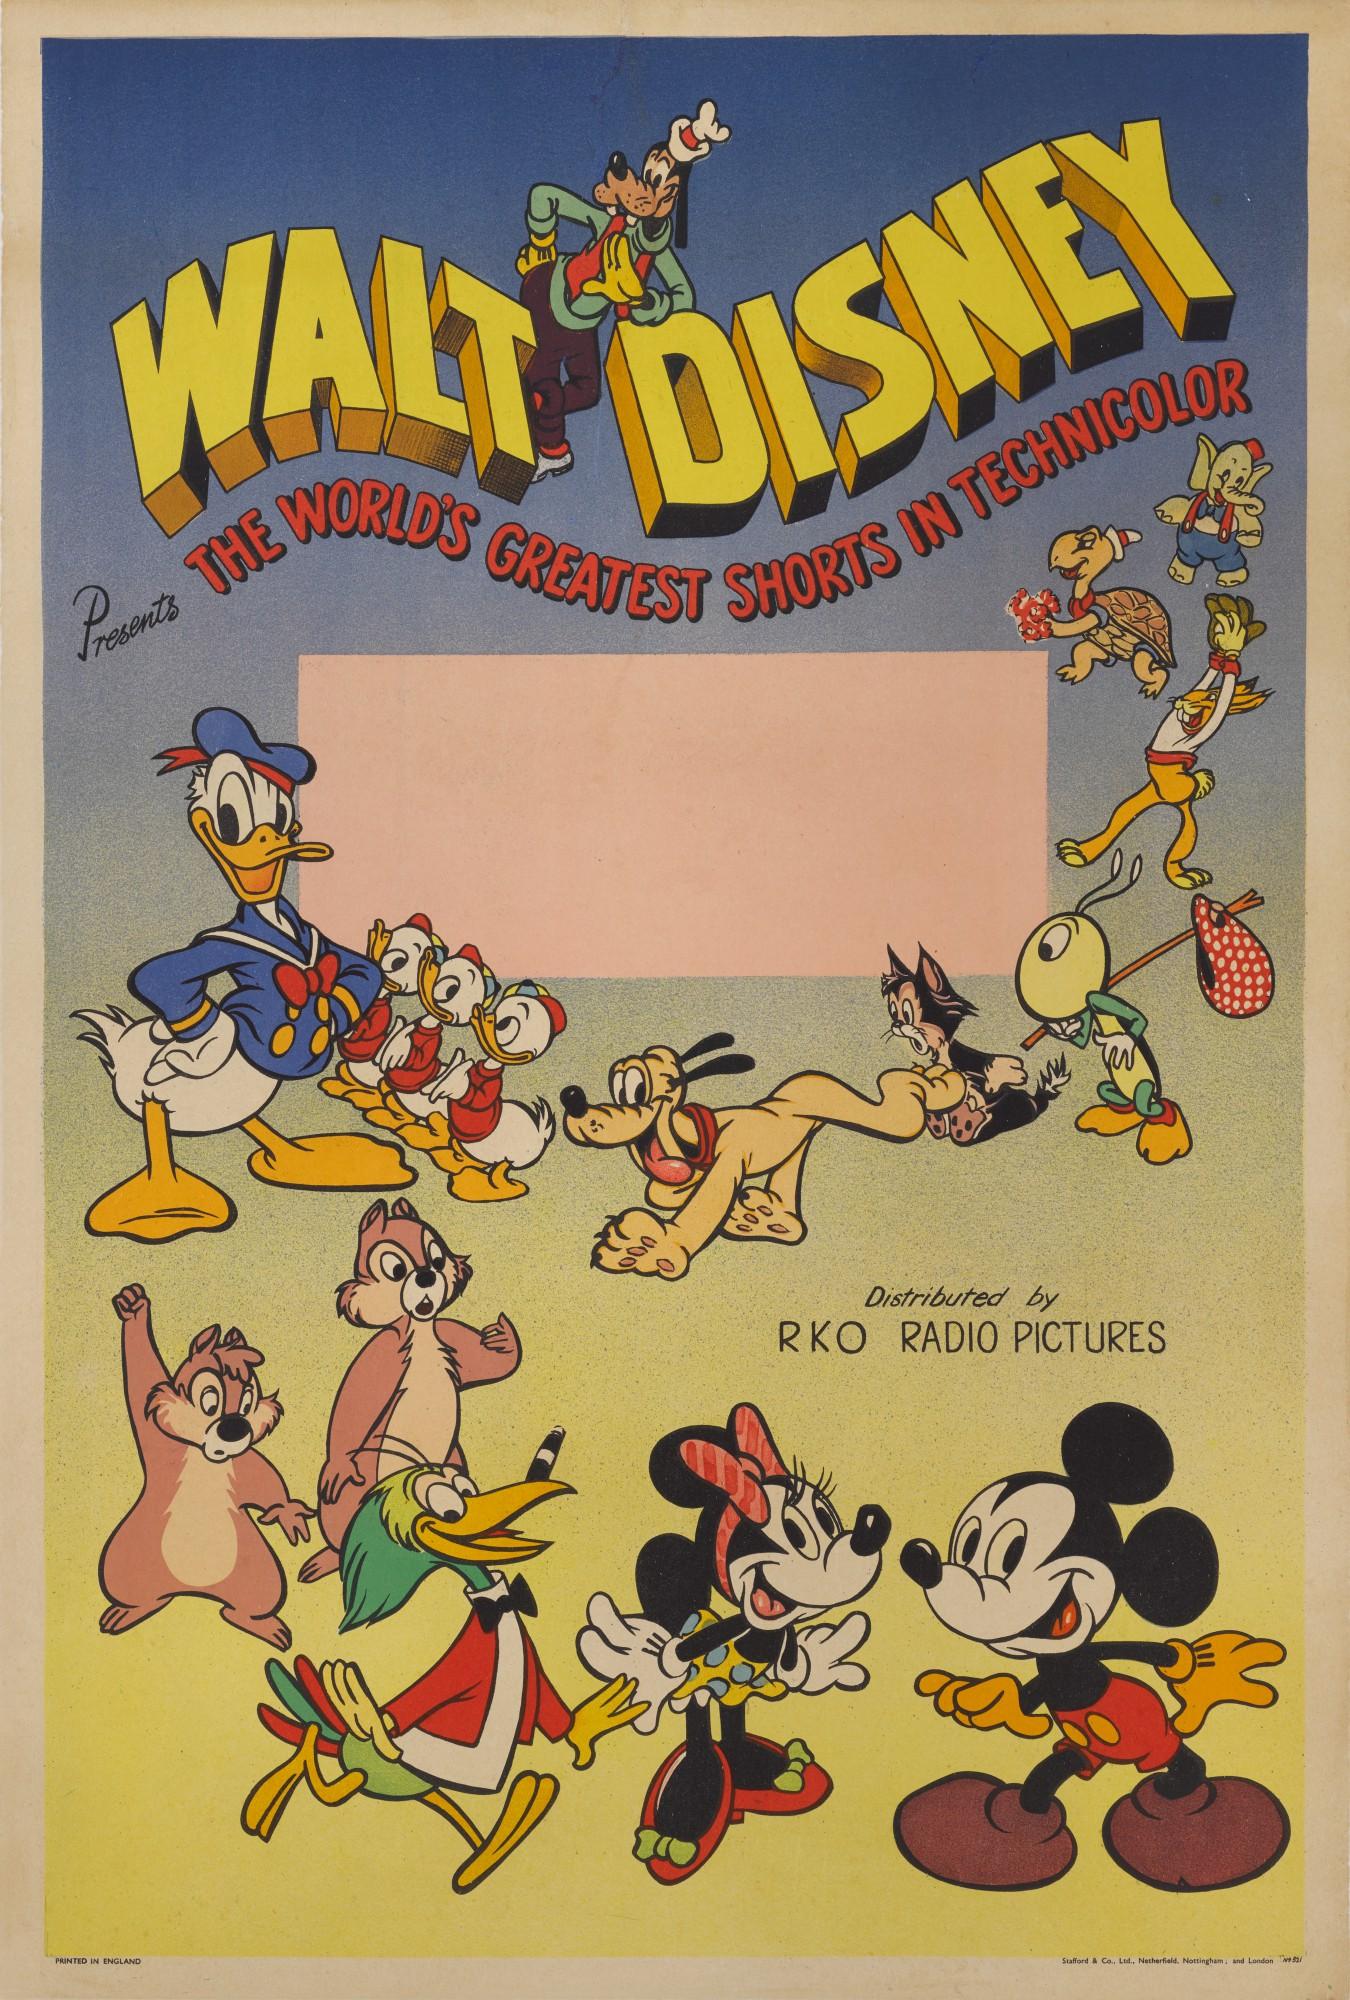 WALT DISNEY PRESENTS THE WORLD'S GREATEST SHORTS (1940) POSTER, BRITISH